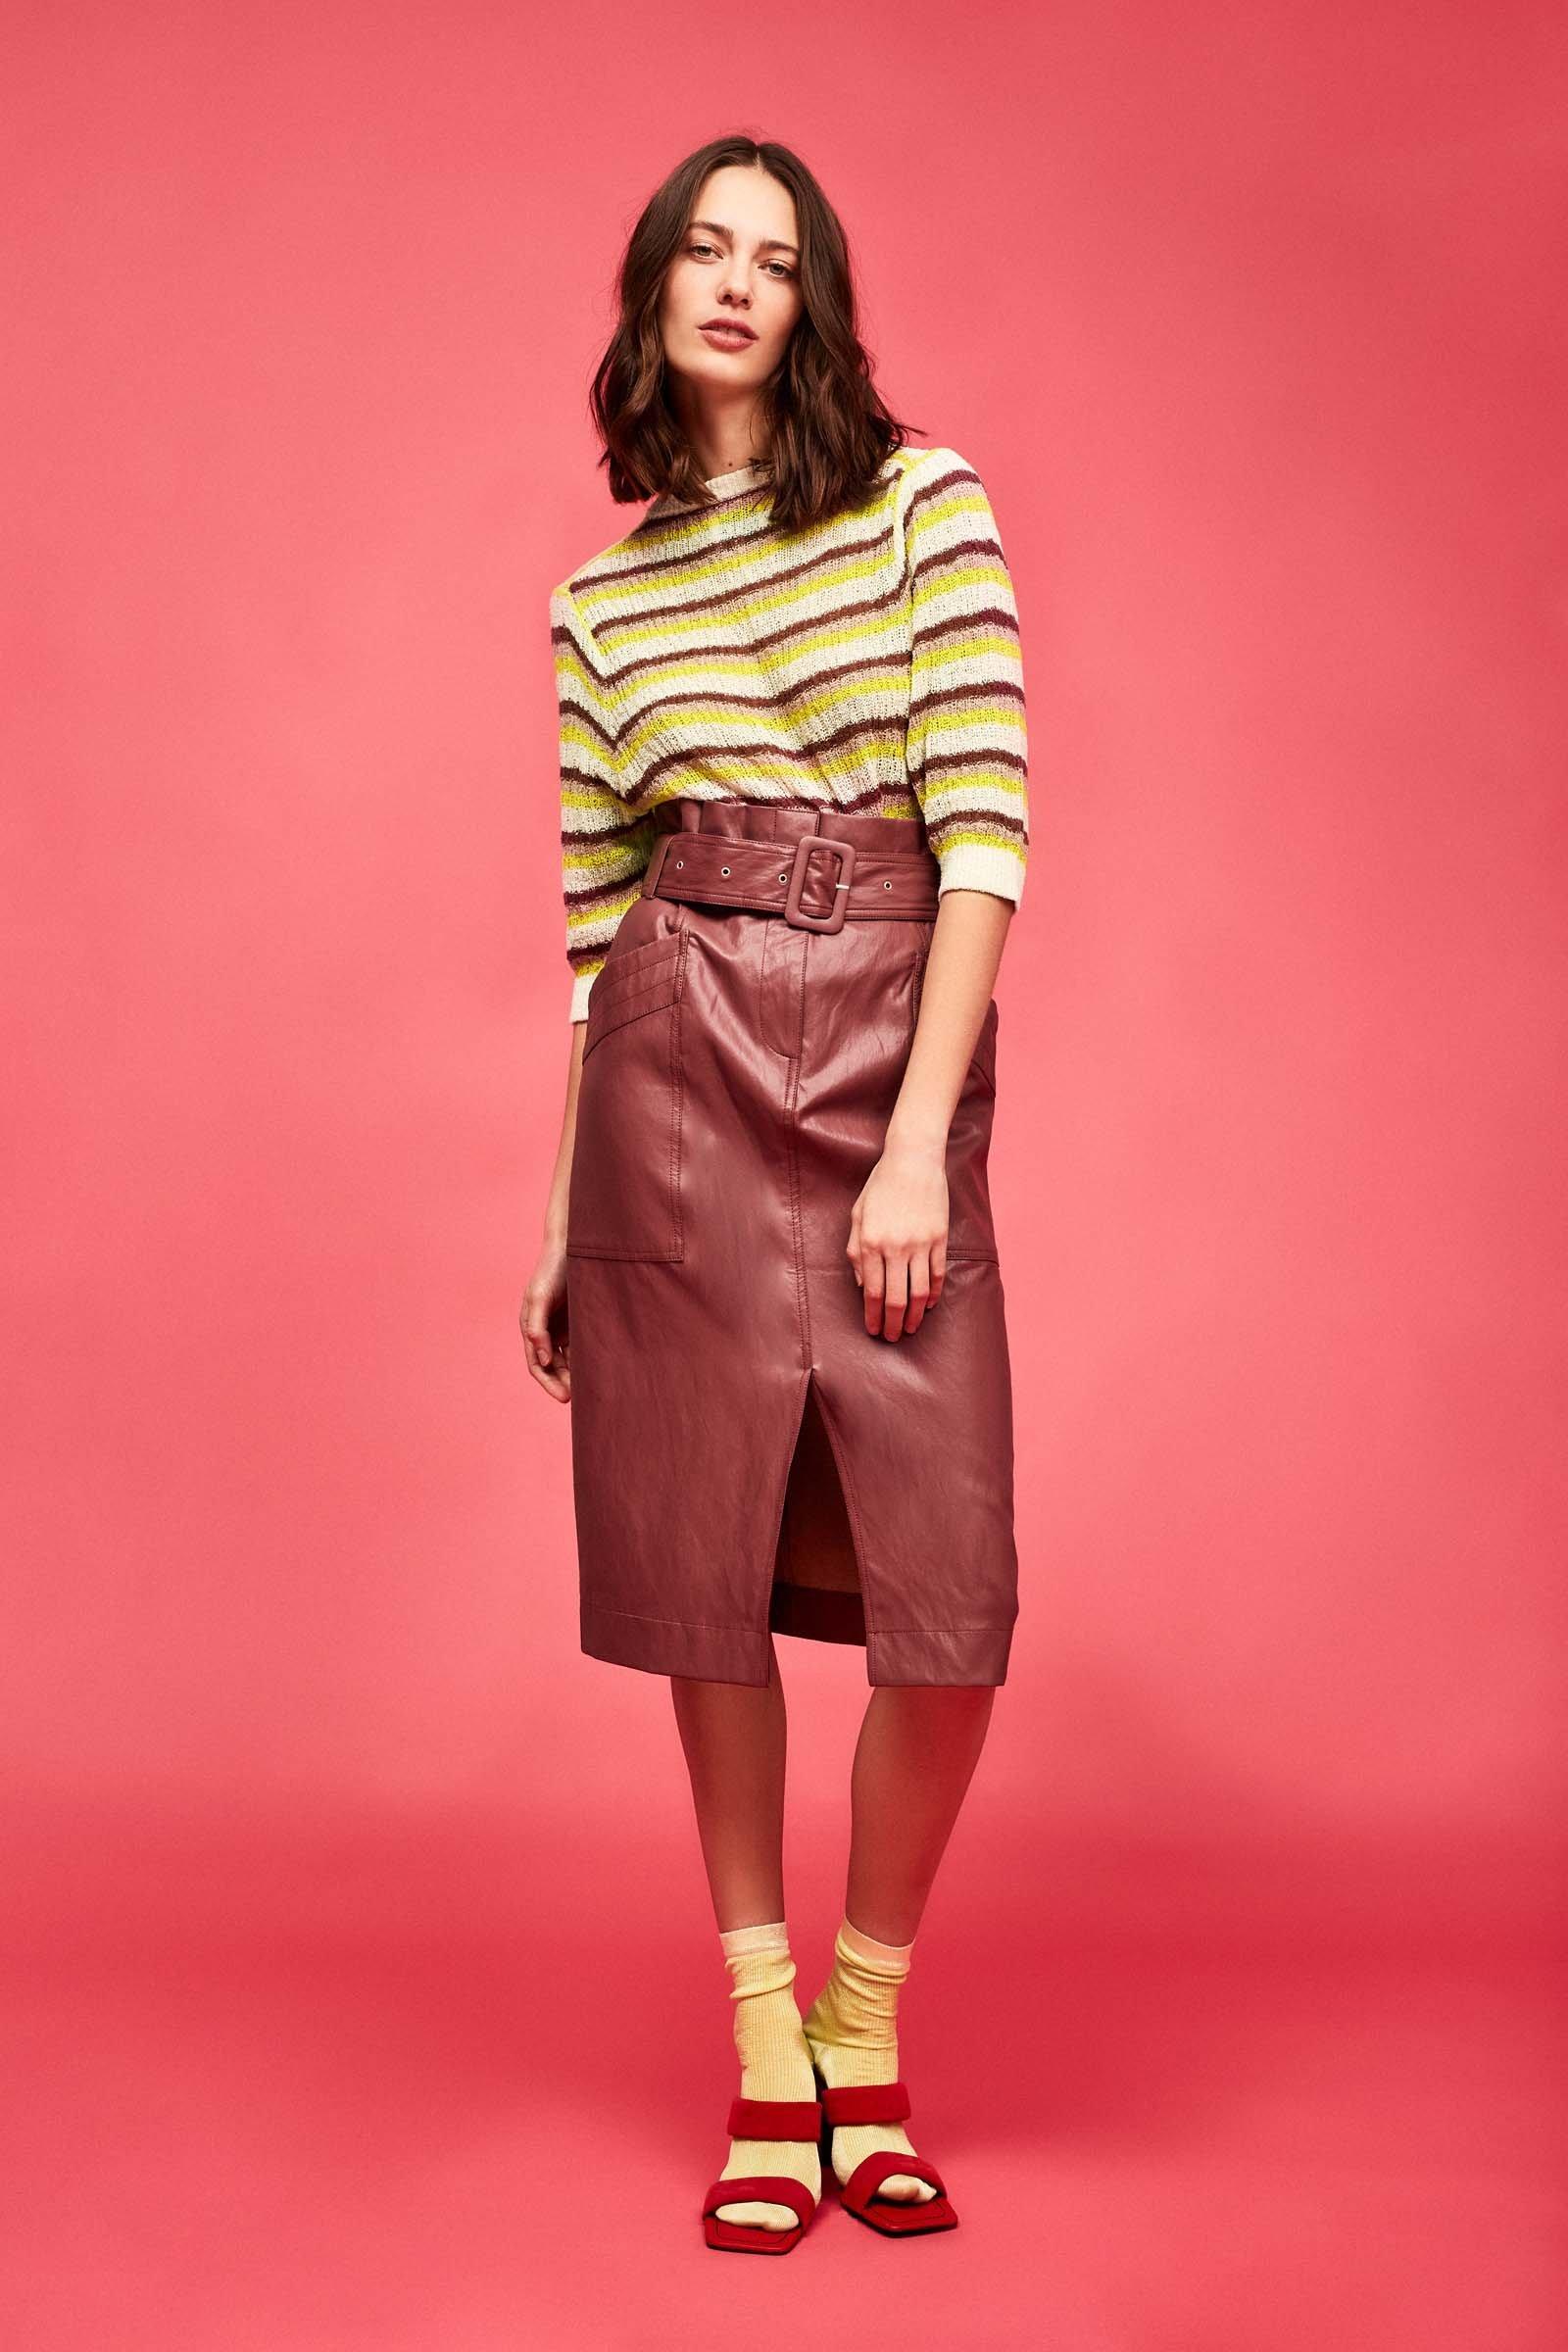 https://webmedia.cks-fashion.com/i/cks/123297ASM_10_l_model